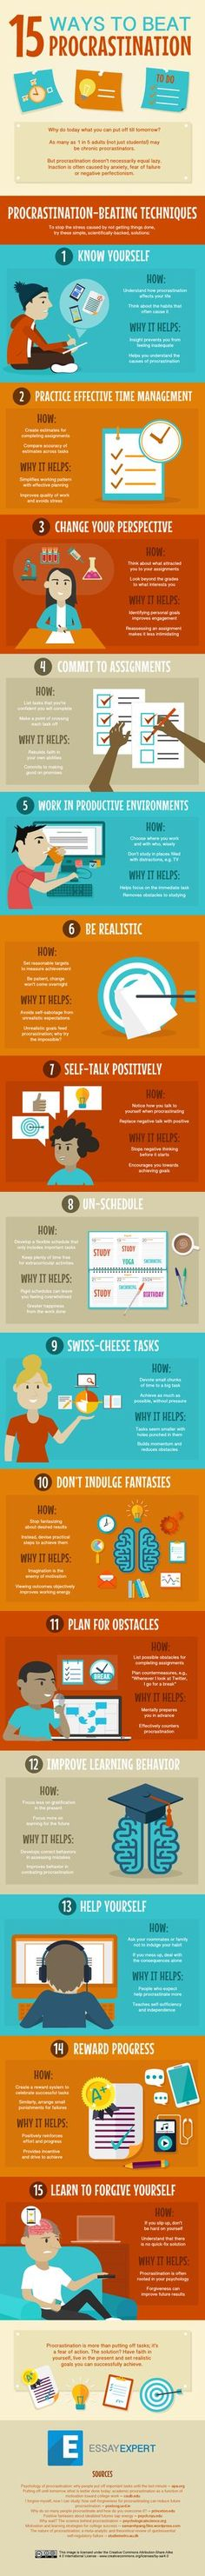 Procrastination : 15 conseils